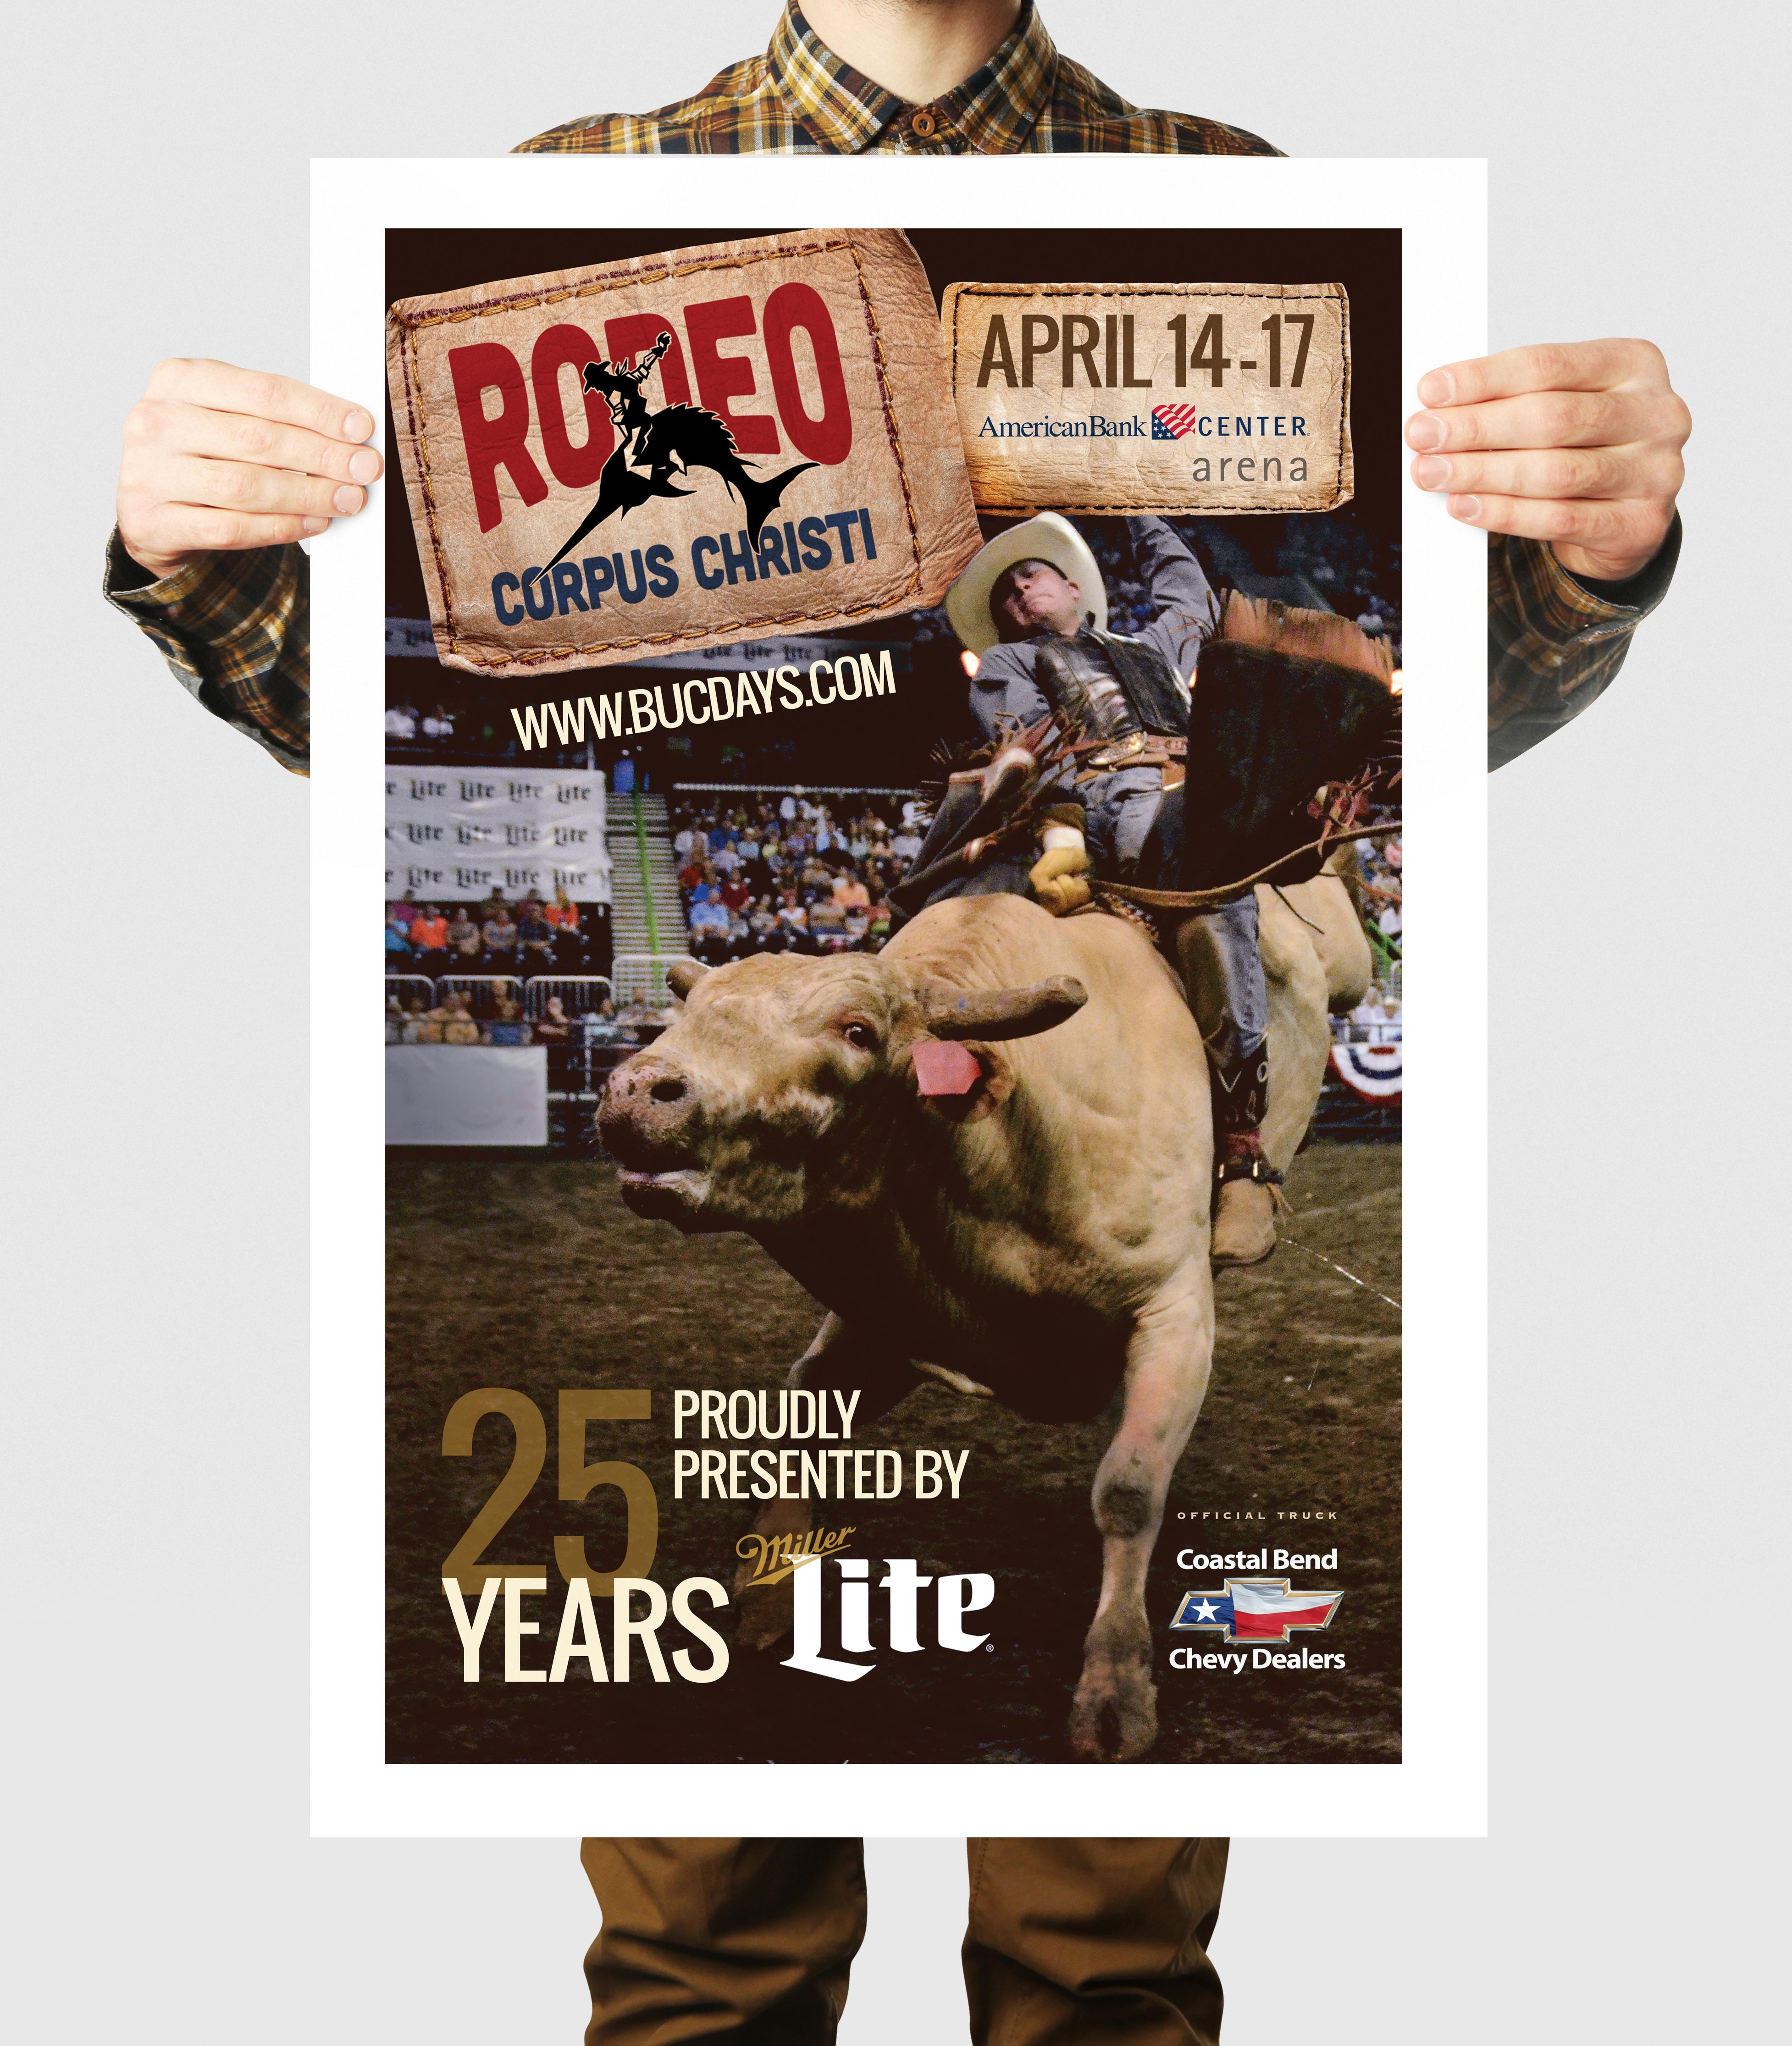 Rodeo Corpus Christi Poster Design